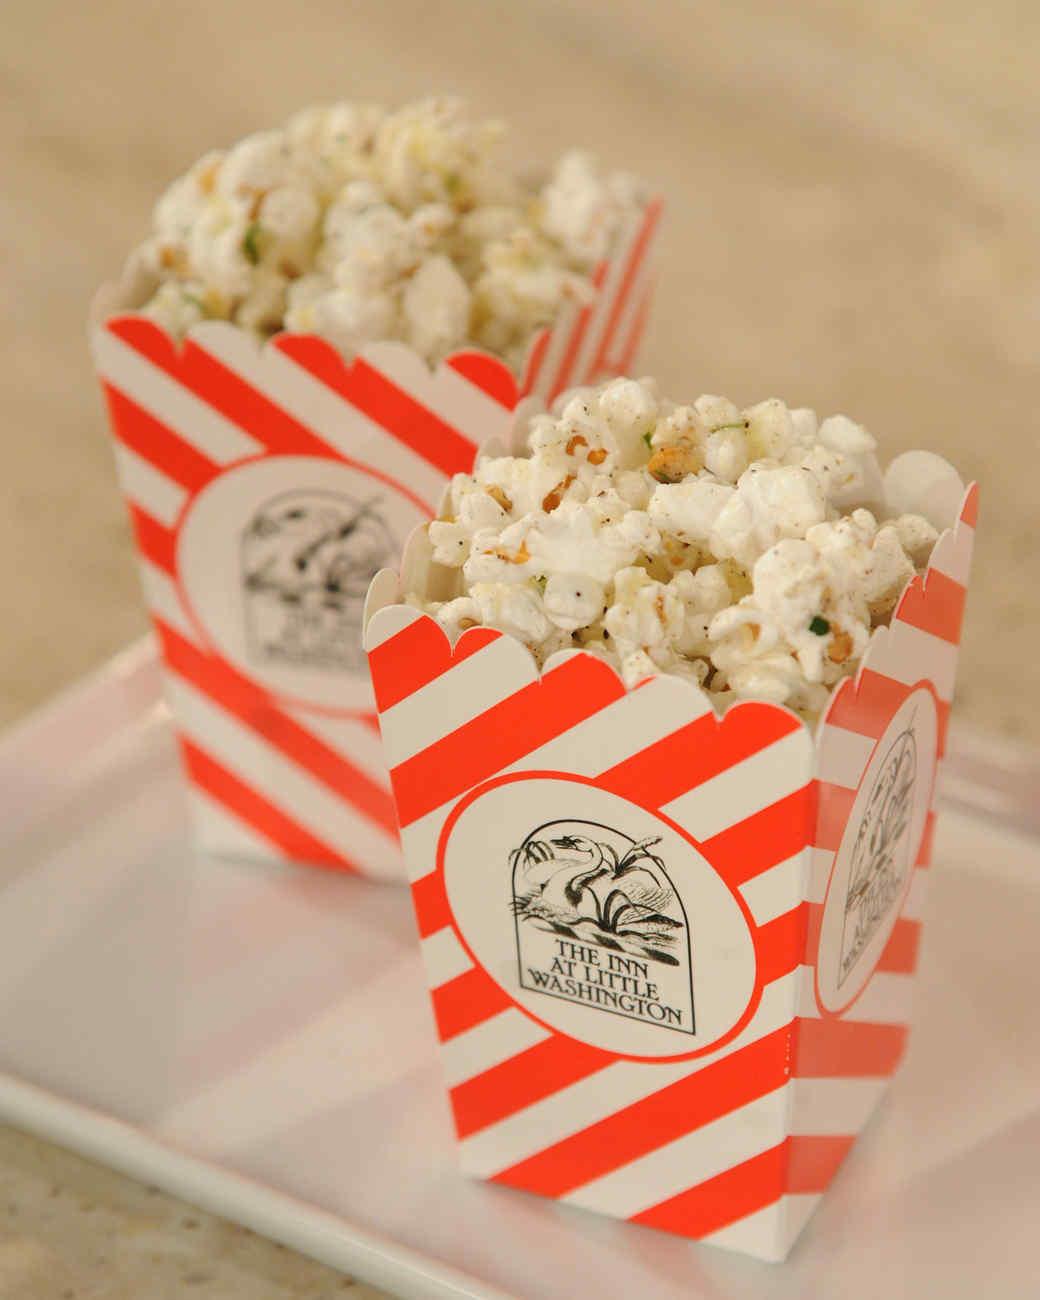 truffled-popcorn-mslb7135.jpg